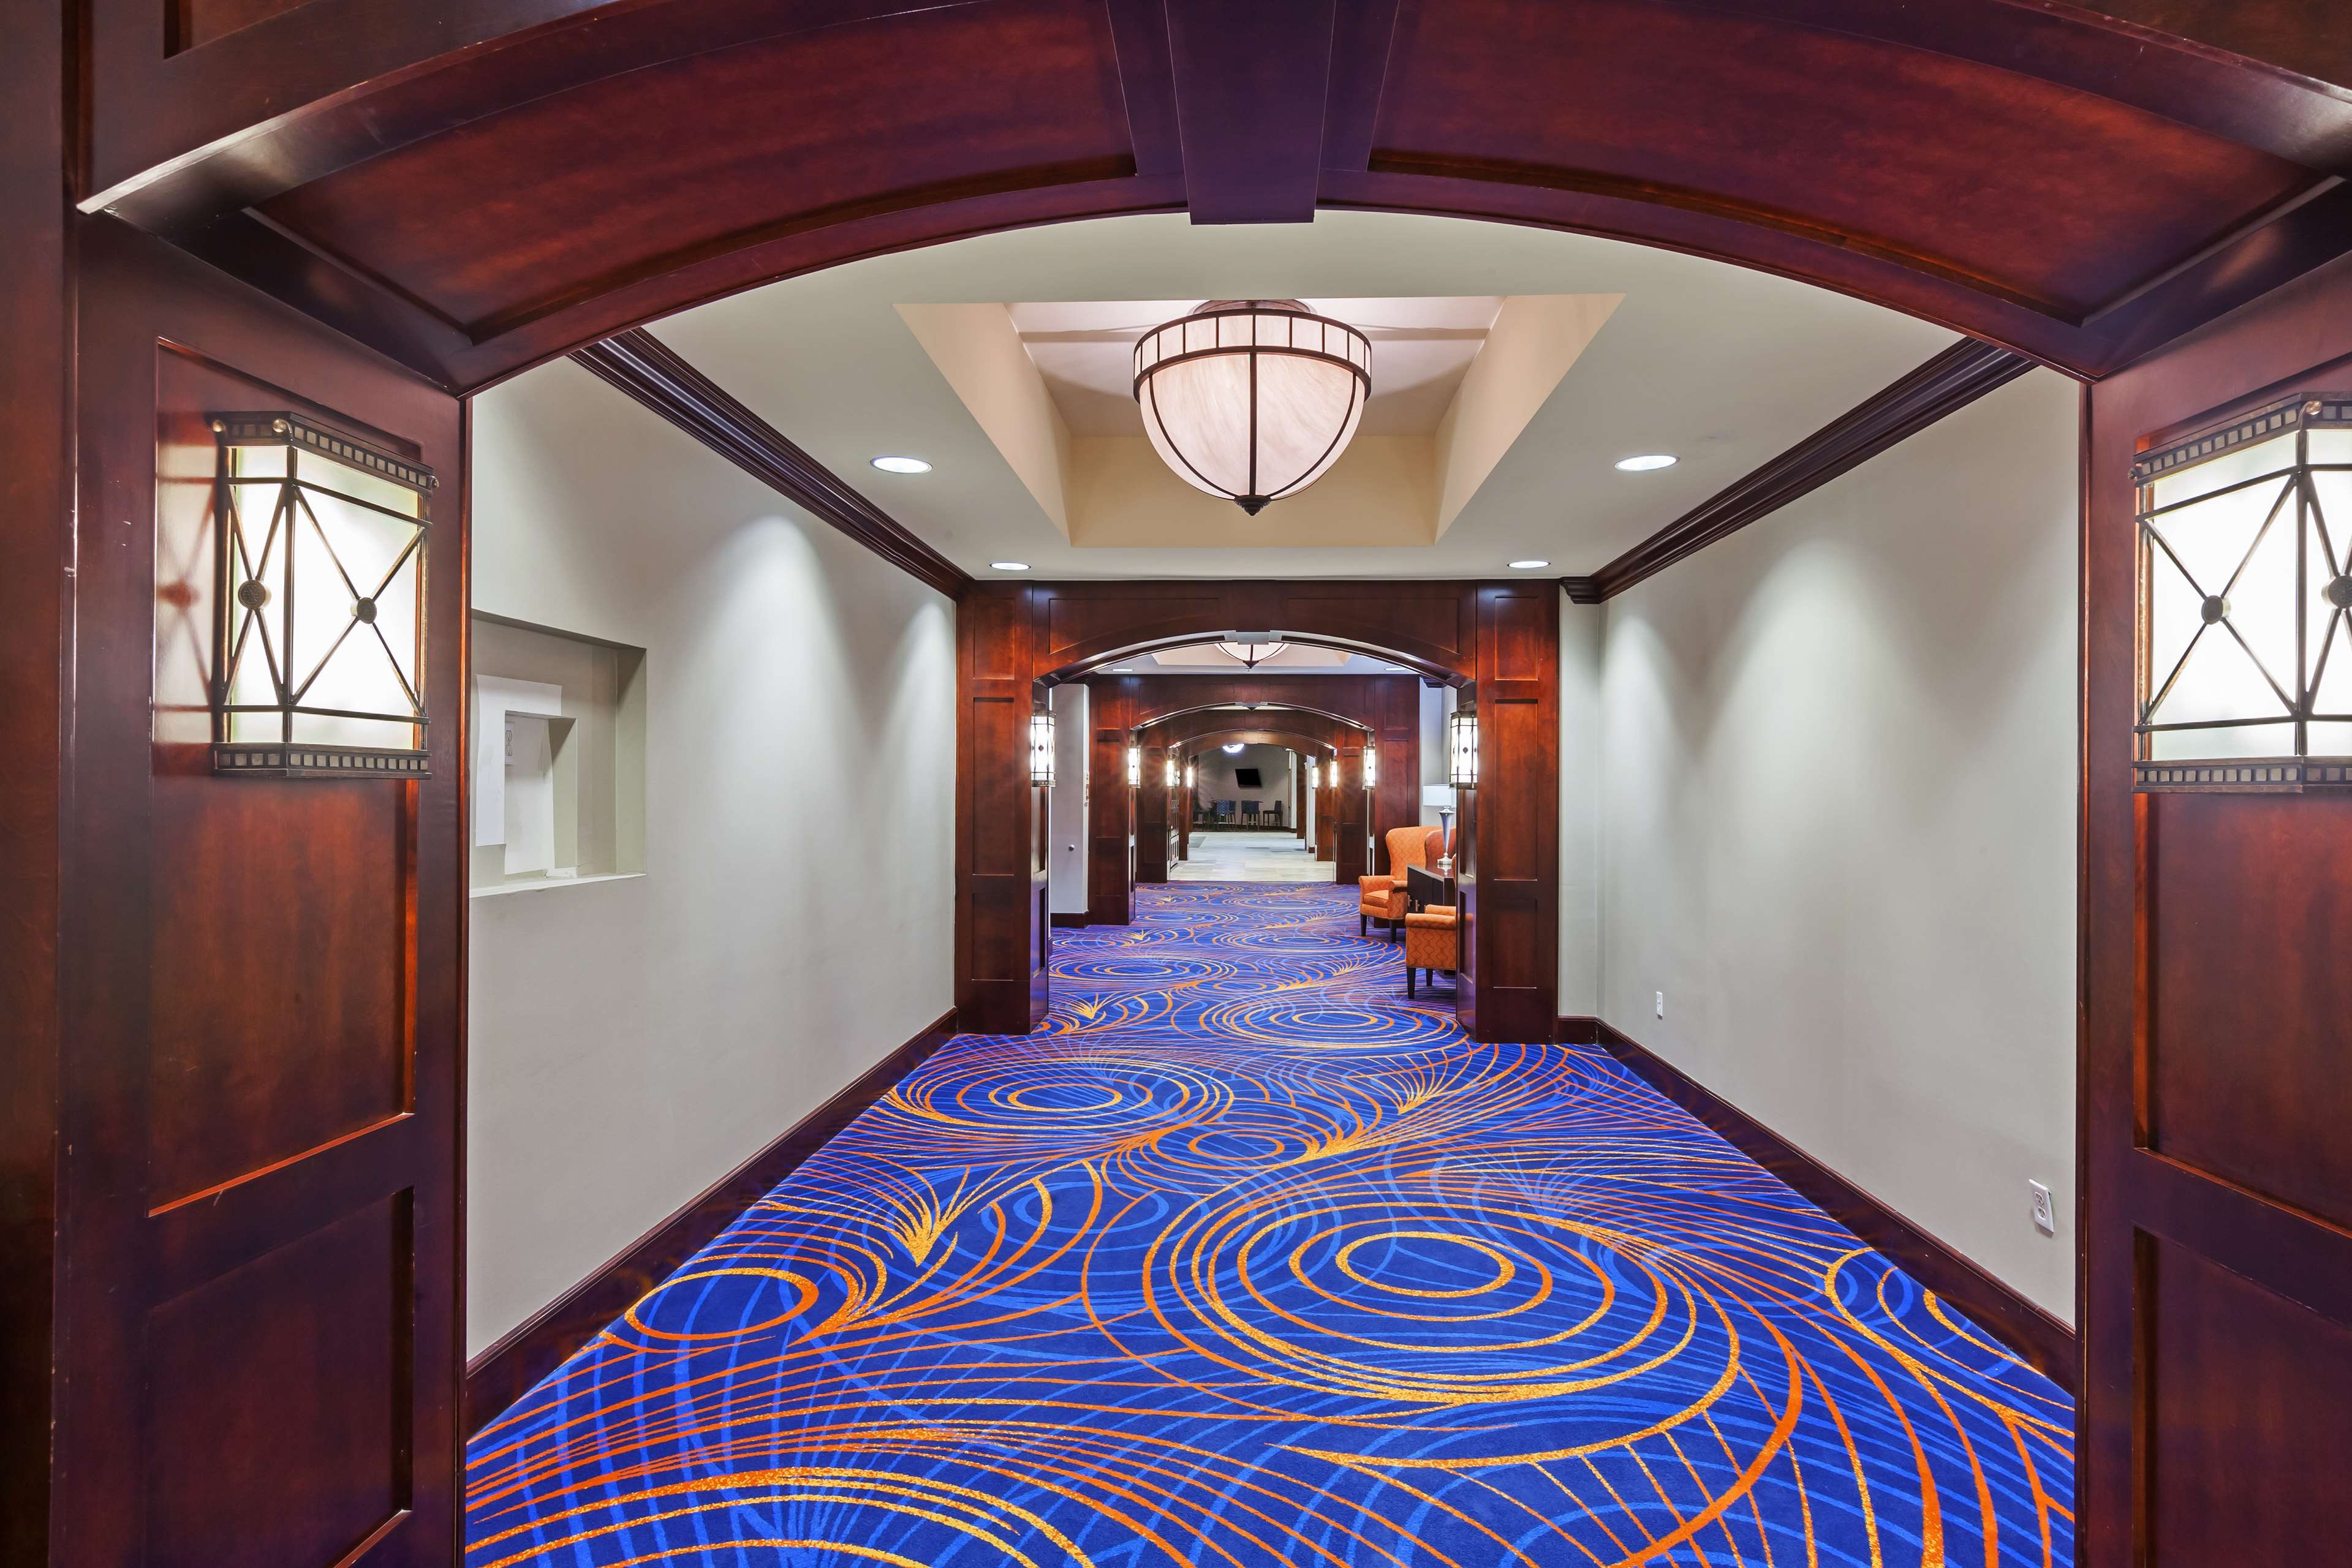 Hilton Waco image 60